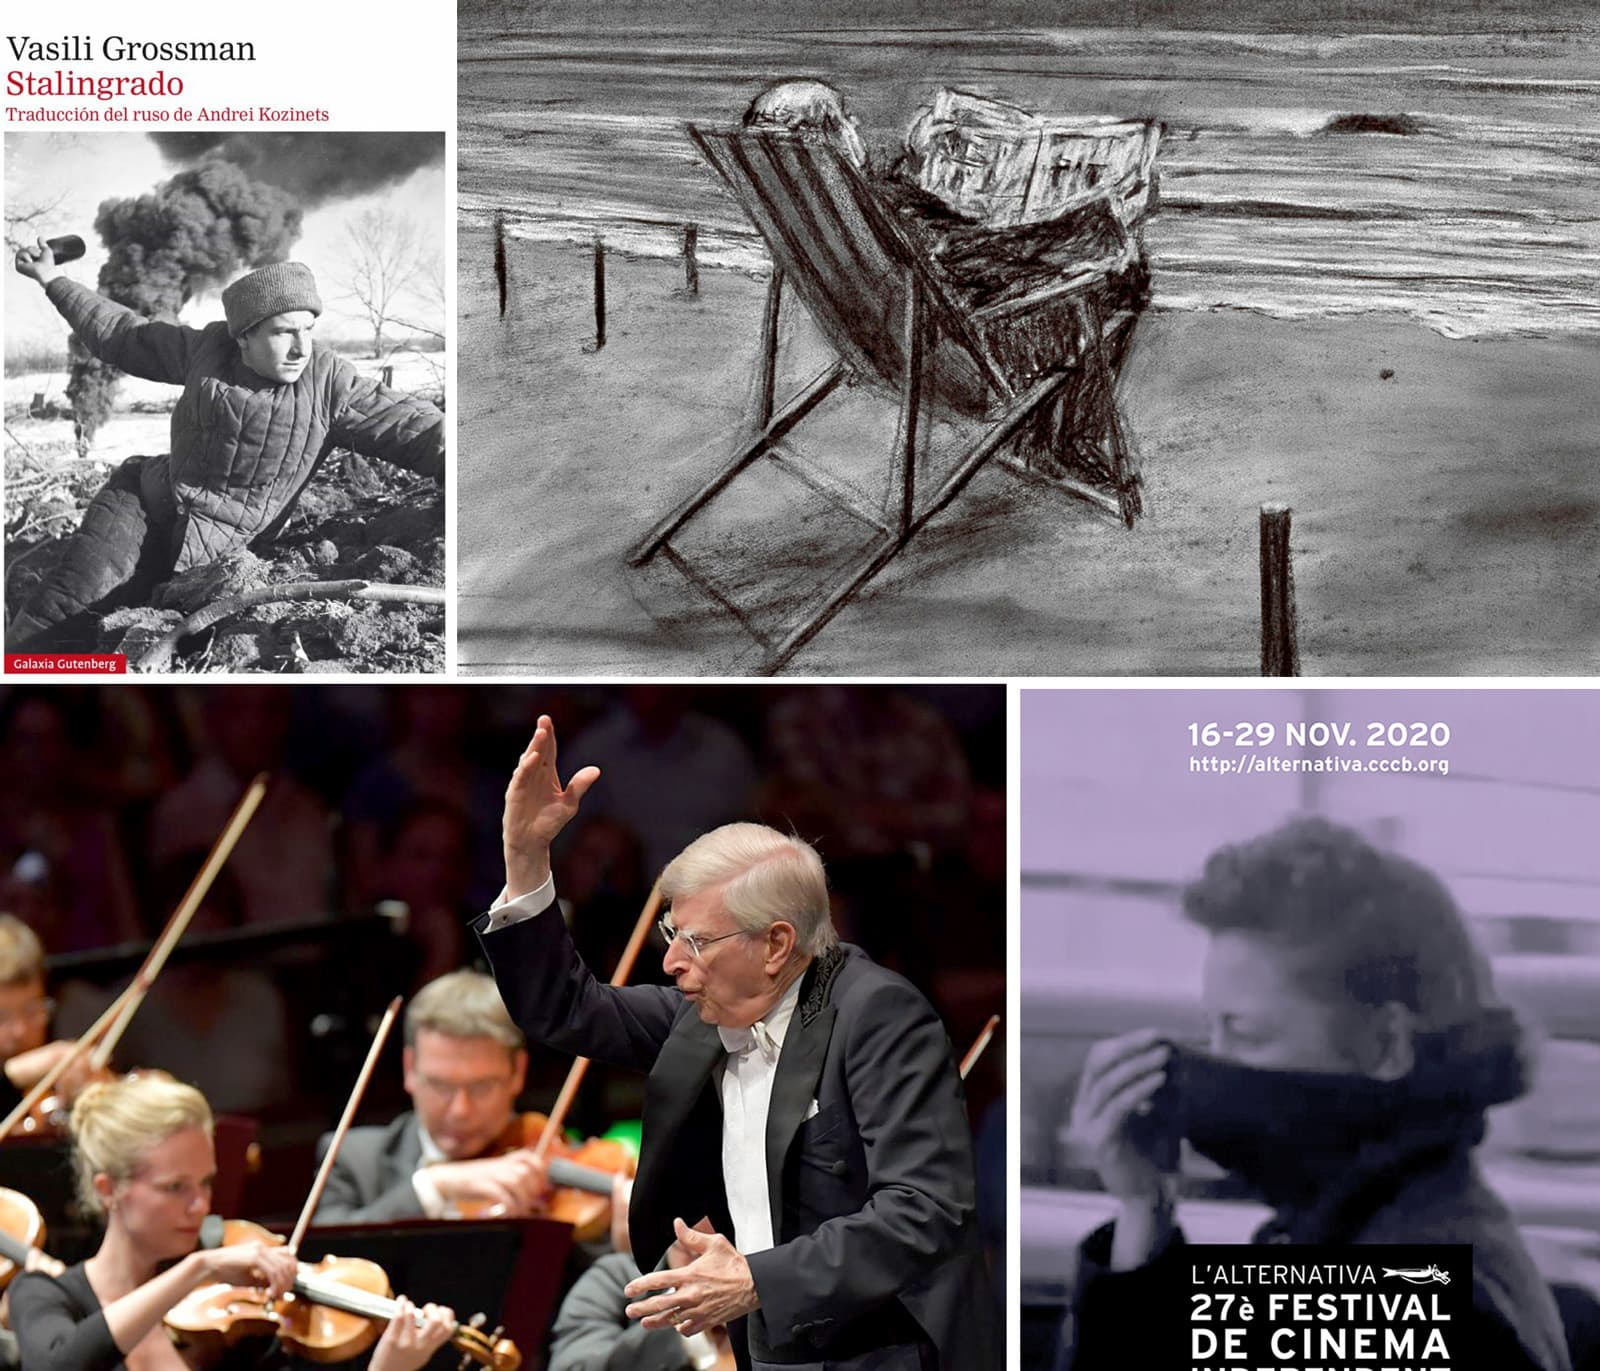 Llibre Stalingrado de Vasili Grossman. Dibuix de William Kentridge. Herbert Blomstedt i l'orquestra de la Gewandhaus de Leipzig. Cartell del Festival de Cinema Independent de Barcelona.